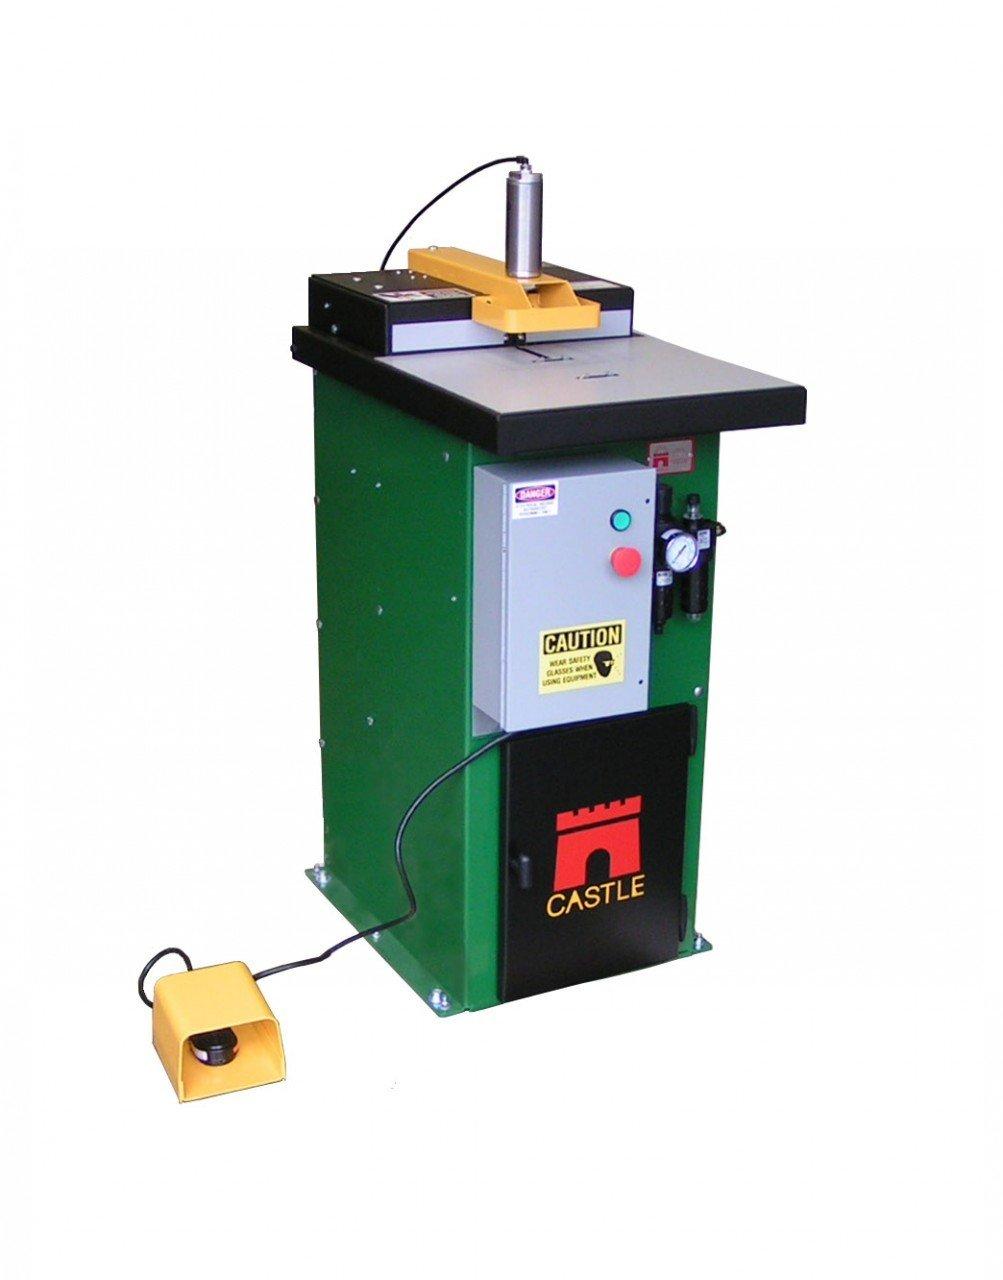 A00036 - TSM-35 Screw Pocket Machine, 460 VAC 3 Phase